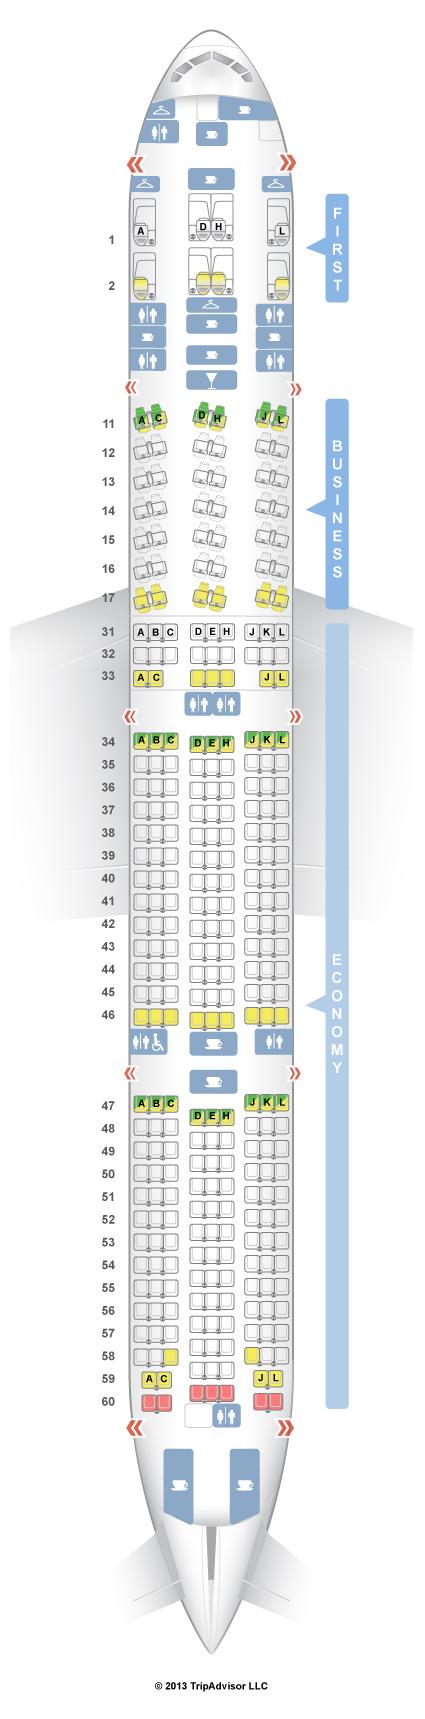 SeatGuru Seat Map Air China Boeing 777-300ER (77W) - photo#35